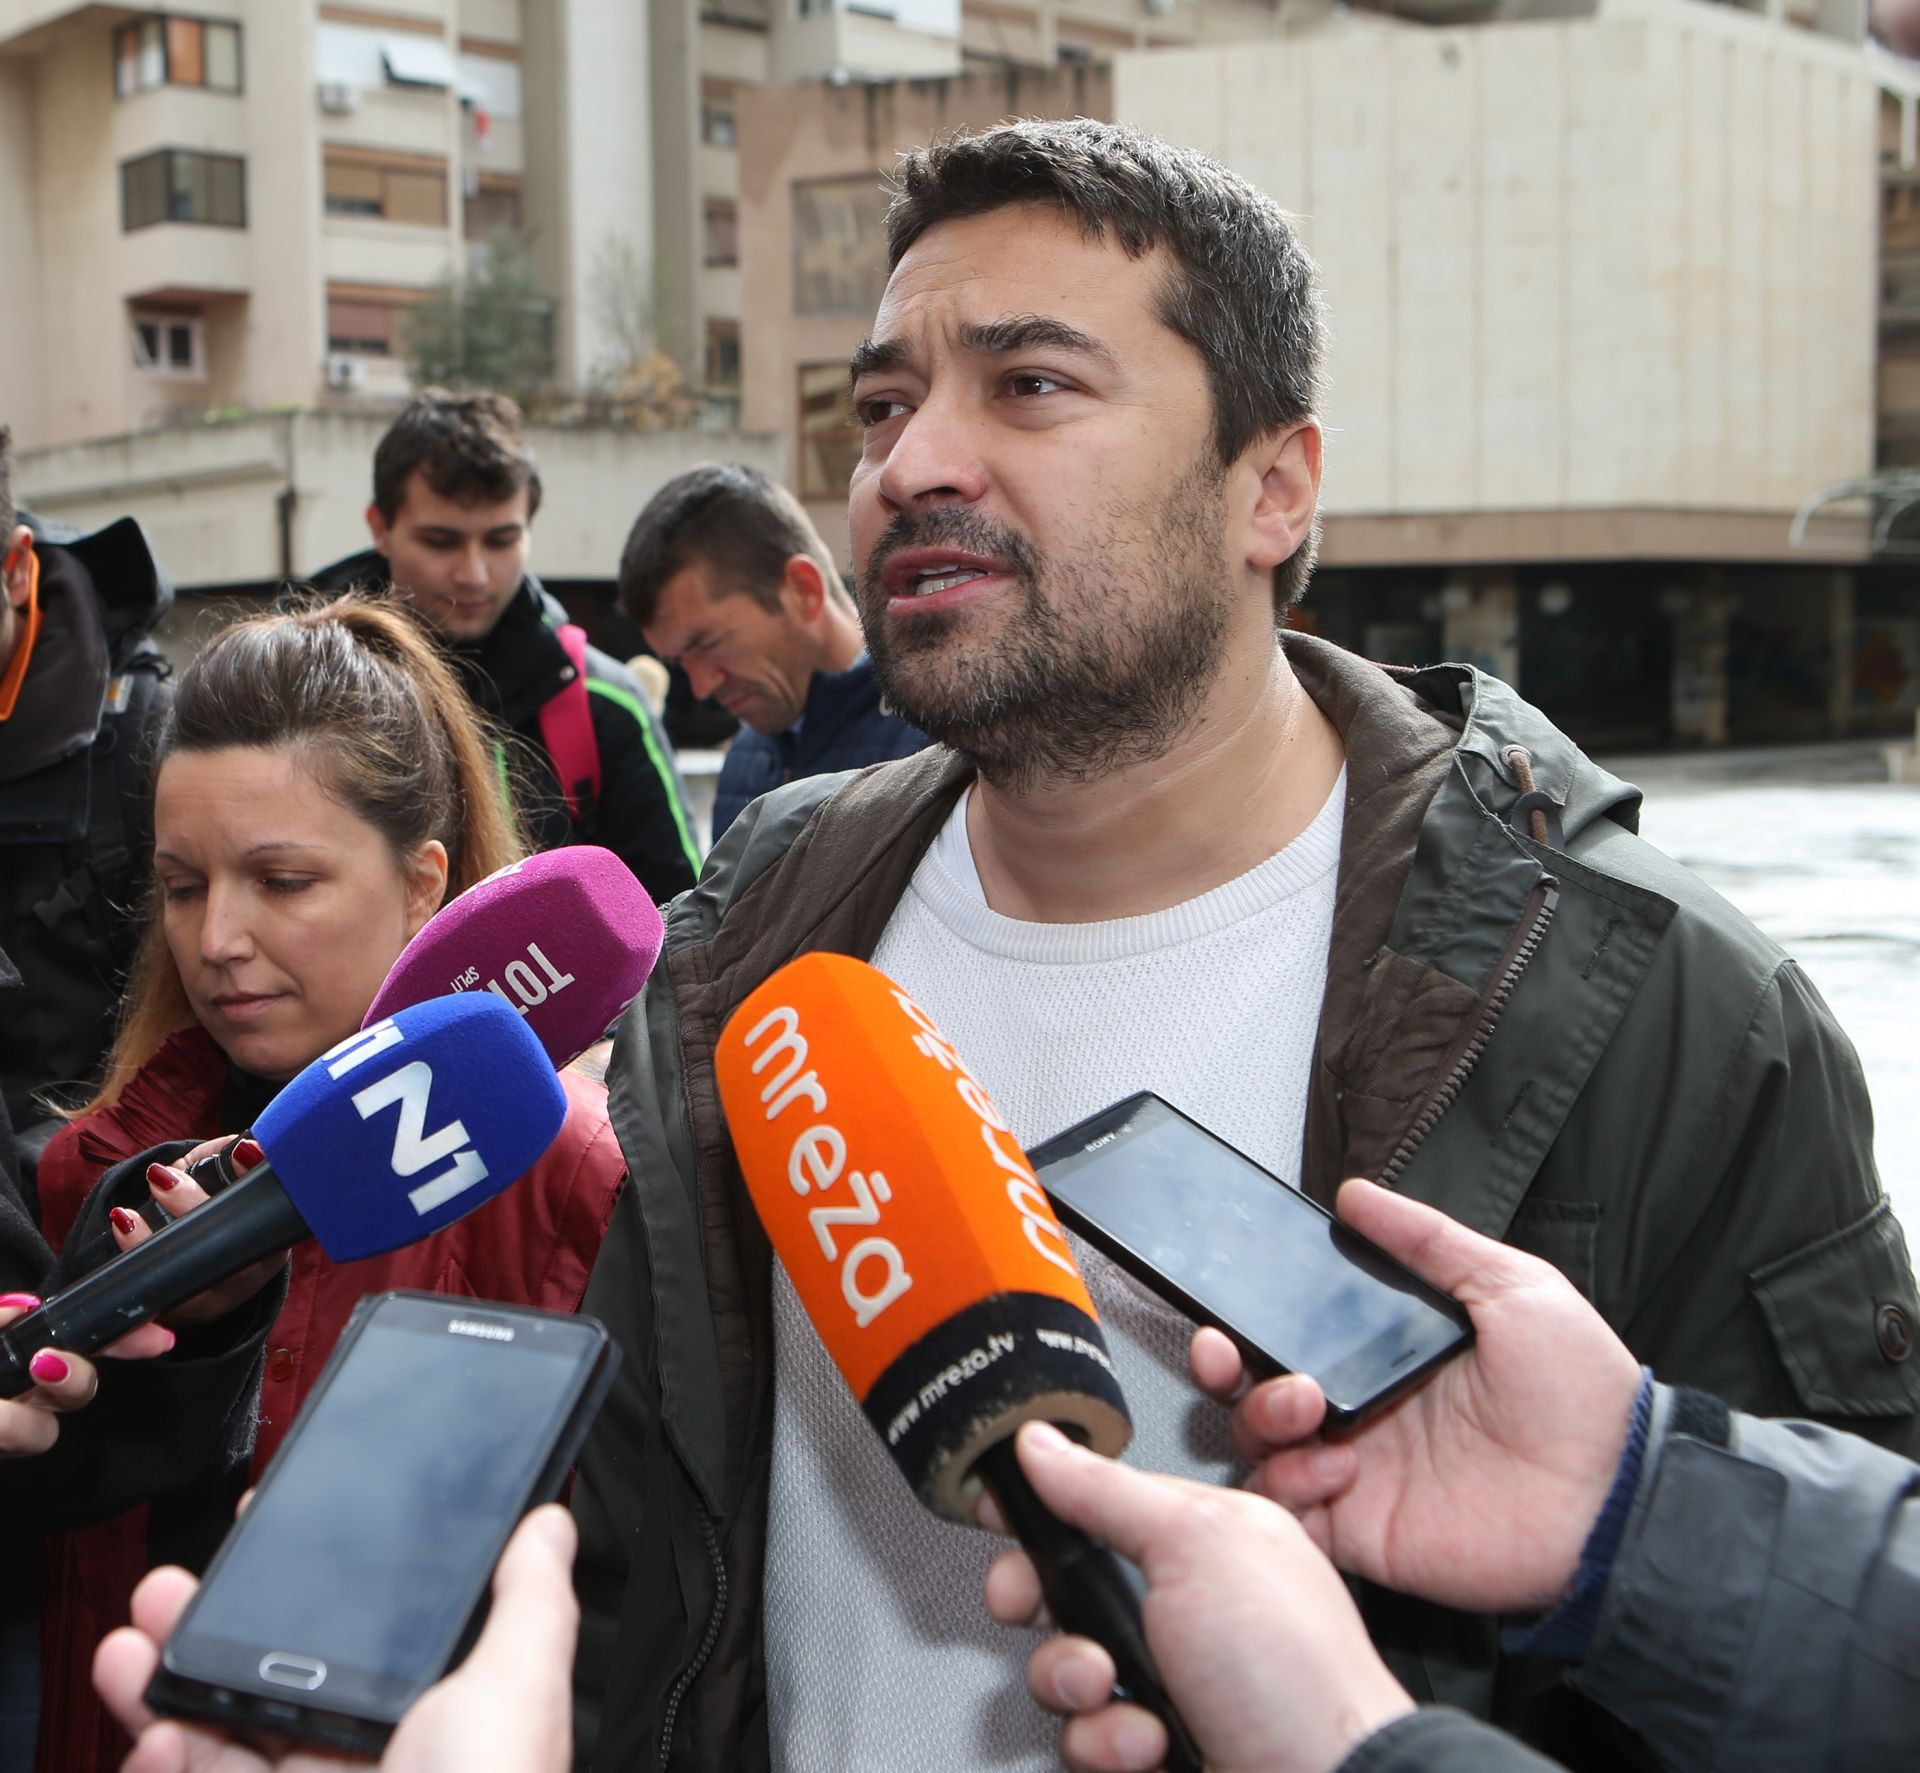 NOVA LJEVICA: Koalicija s Radničkom frontom, Markovina kandidat za gradonačelnika Splita